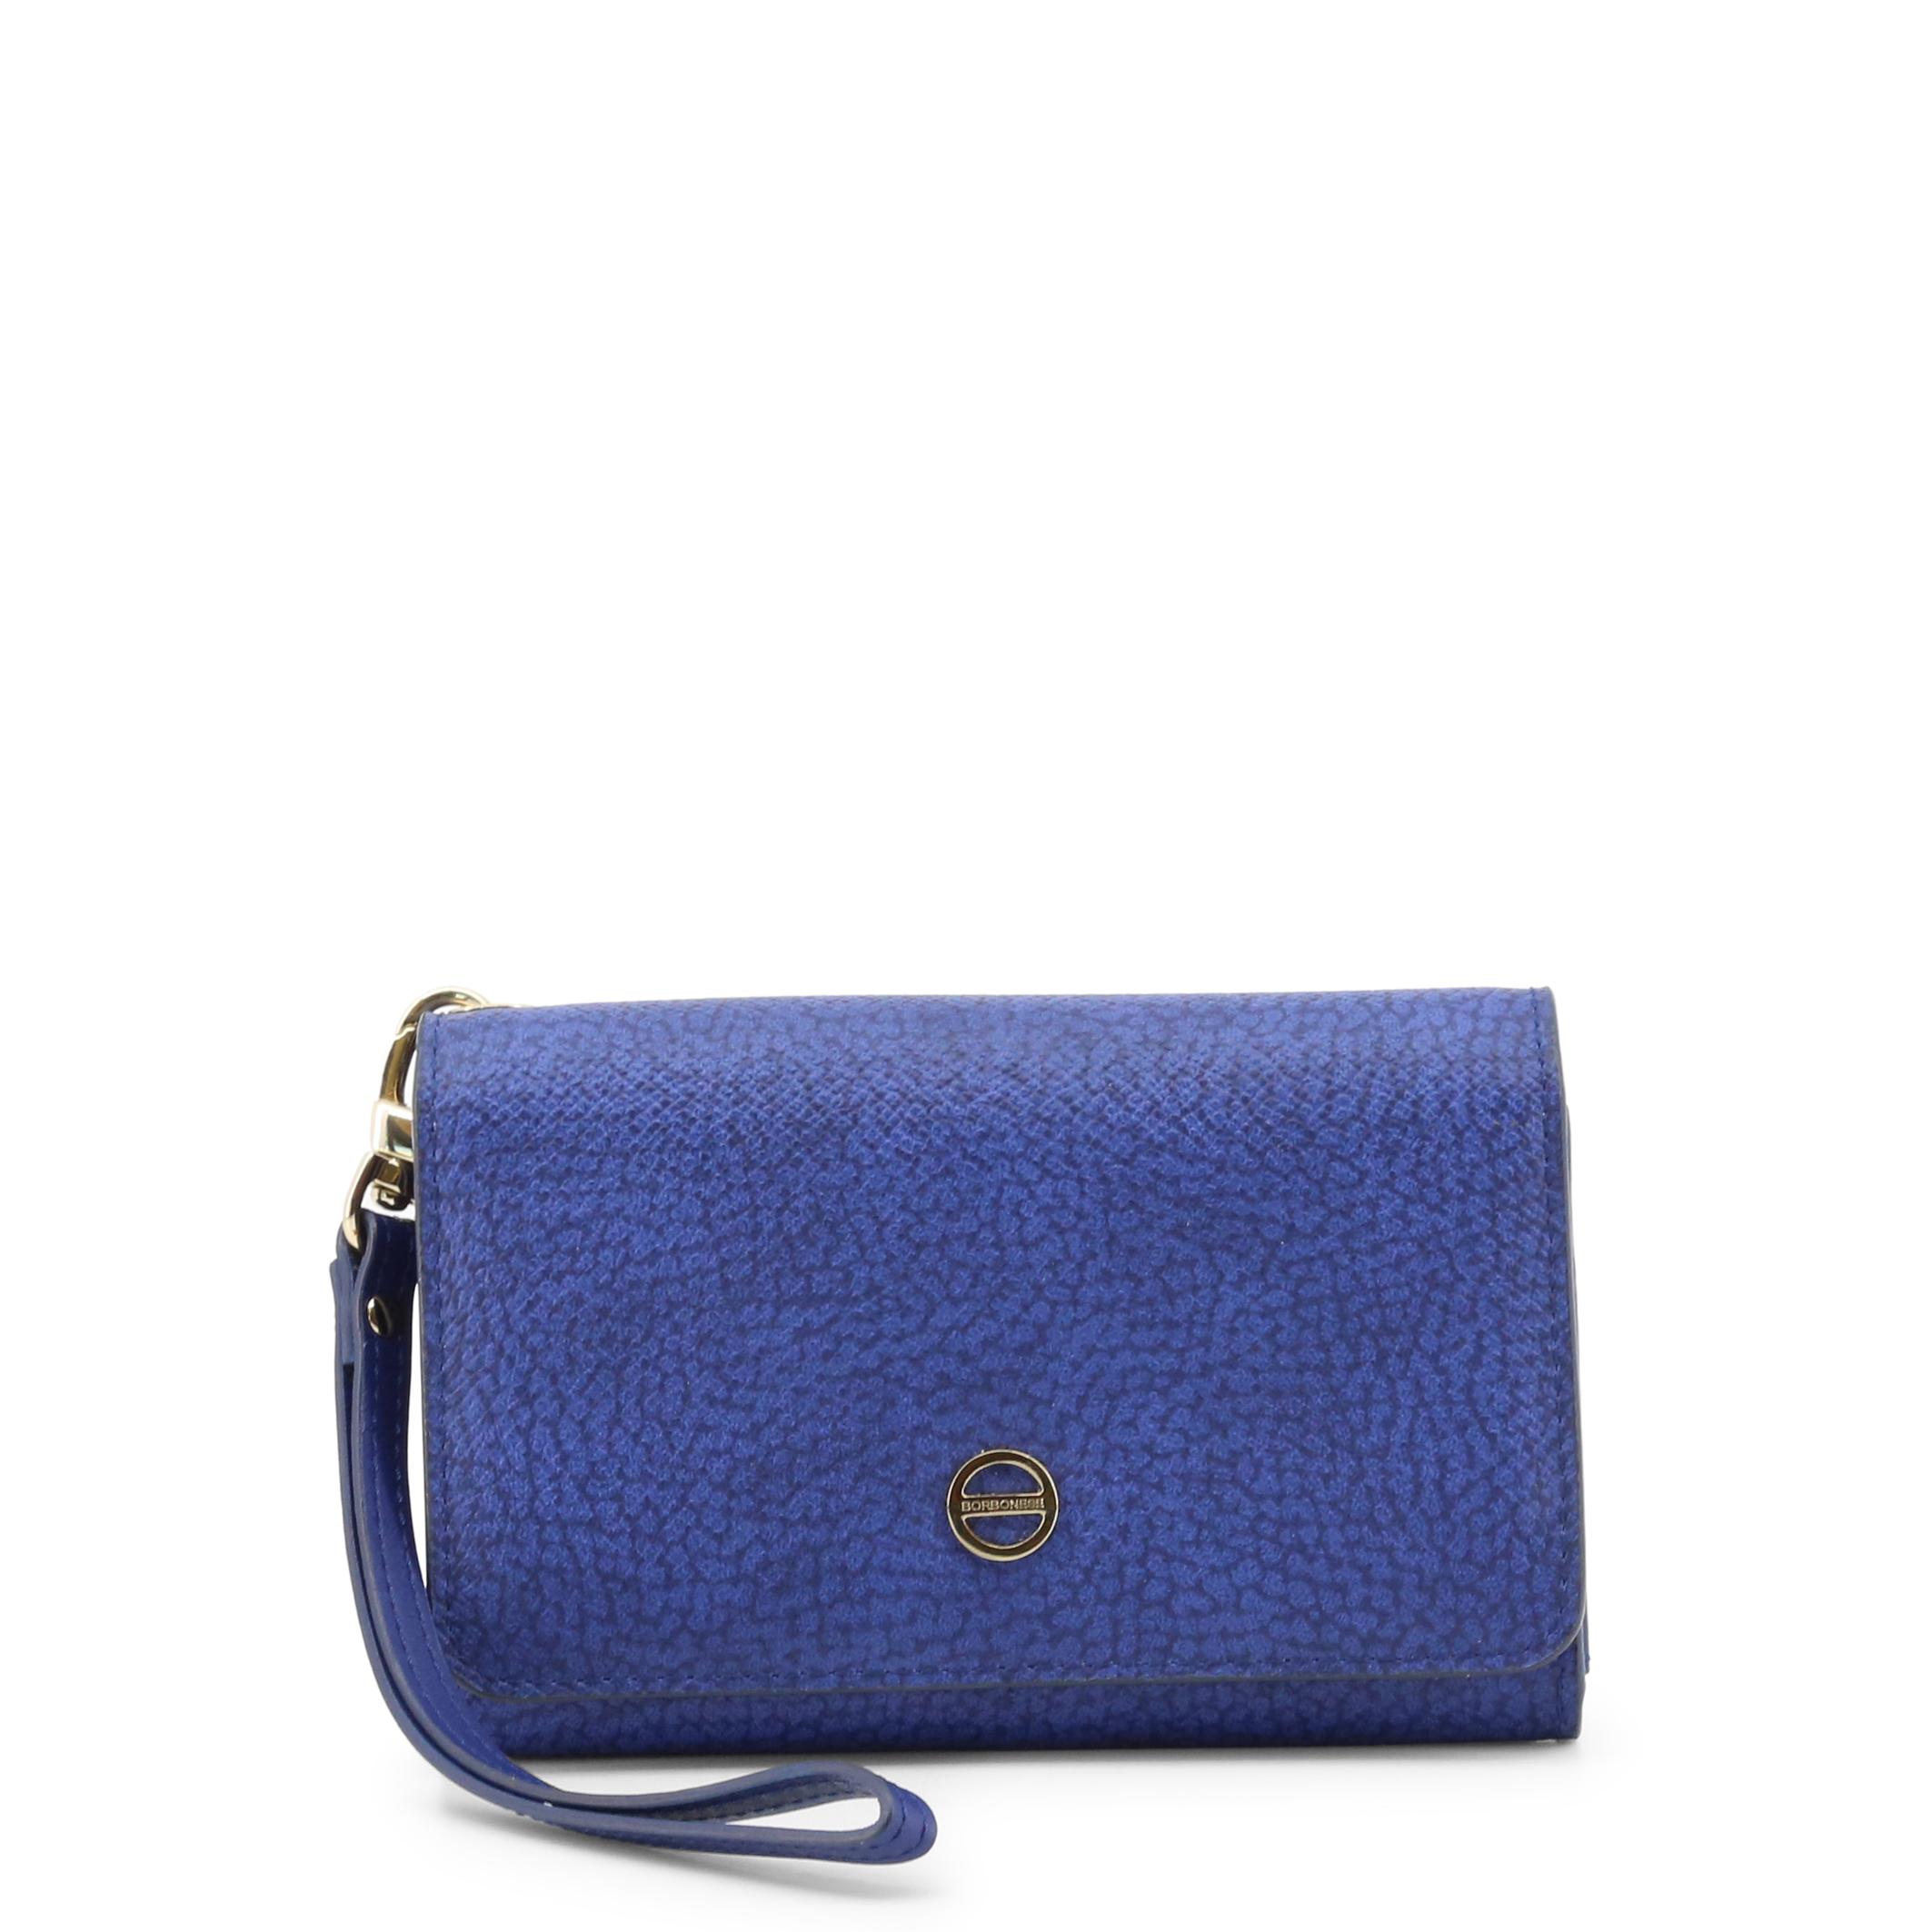 Borbonese - 900306-171 - Blue